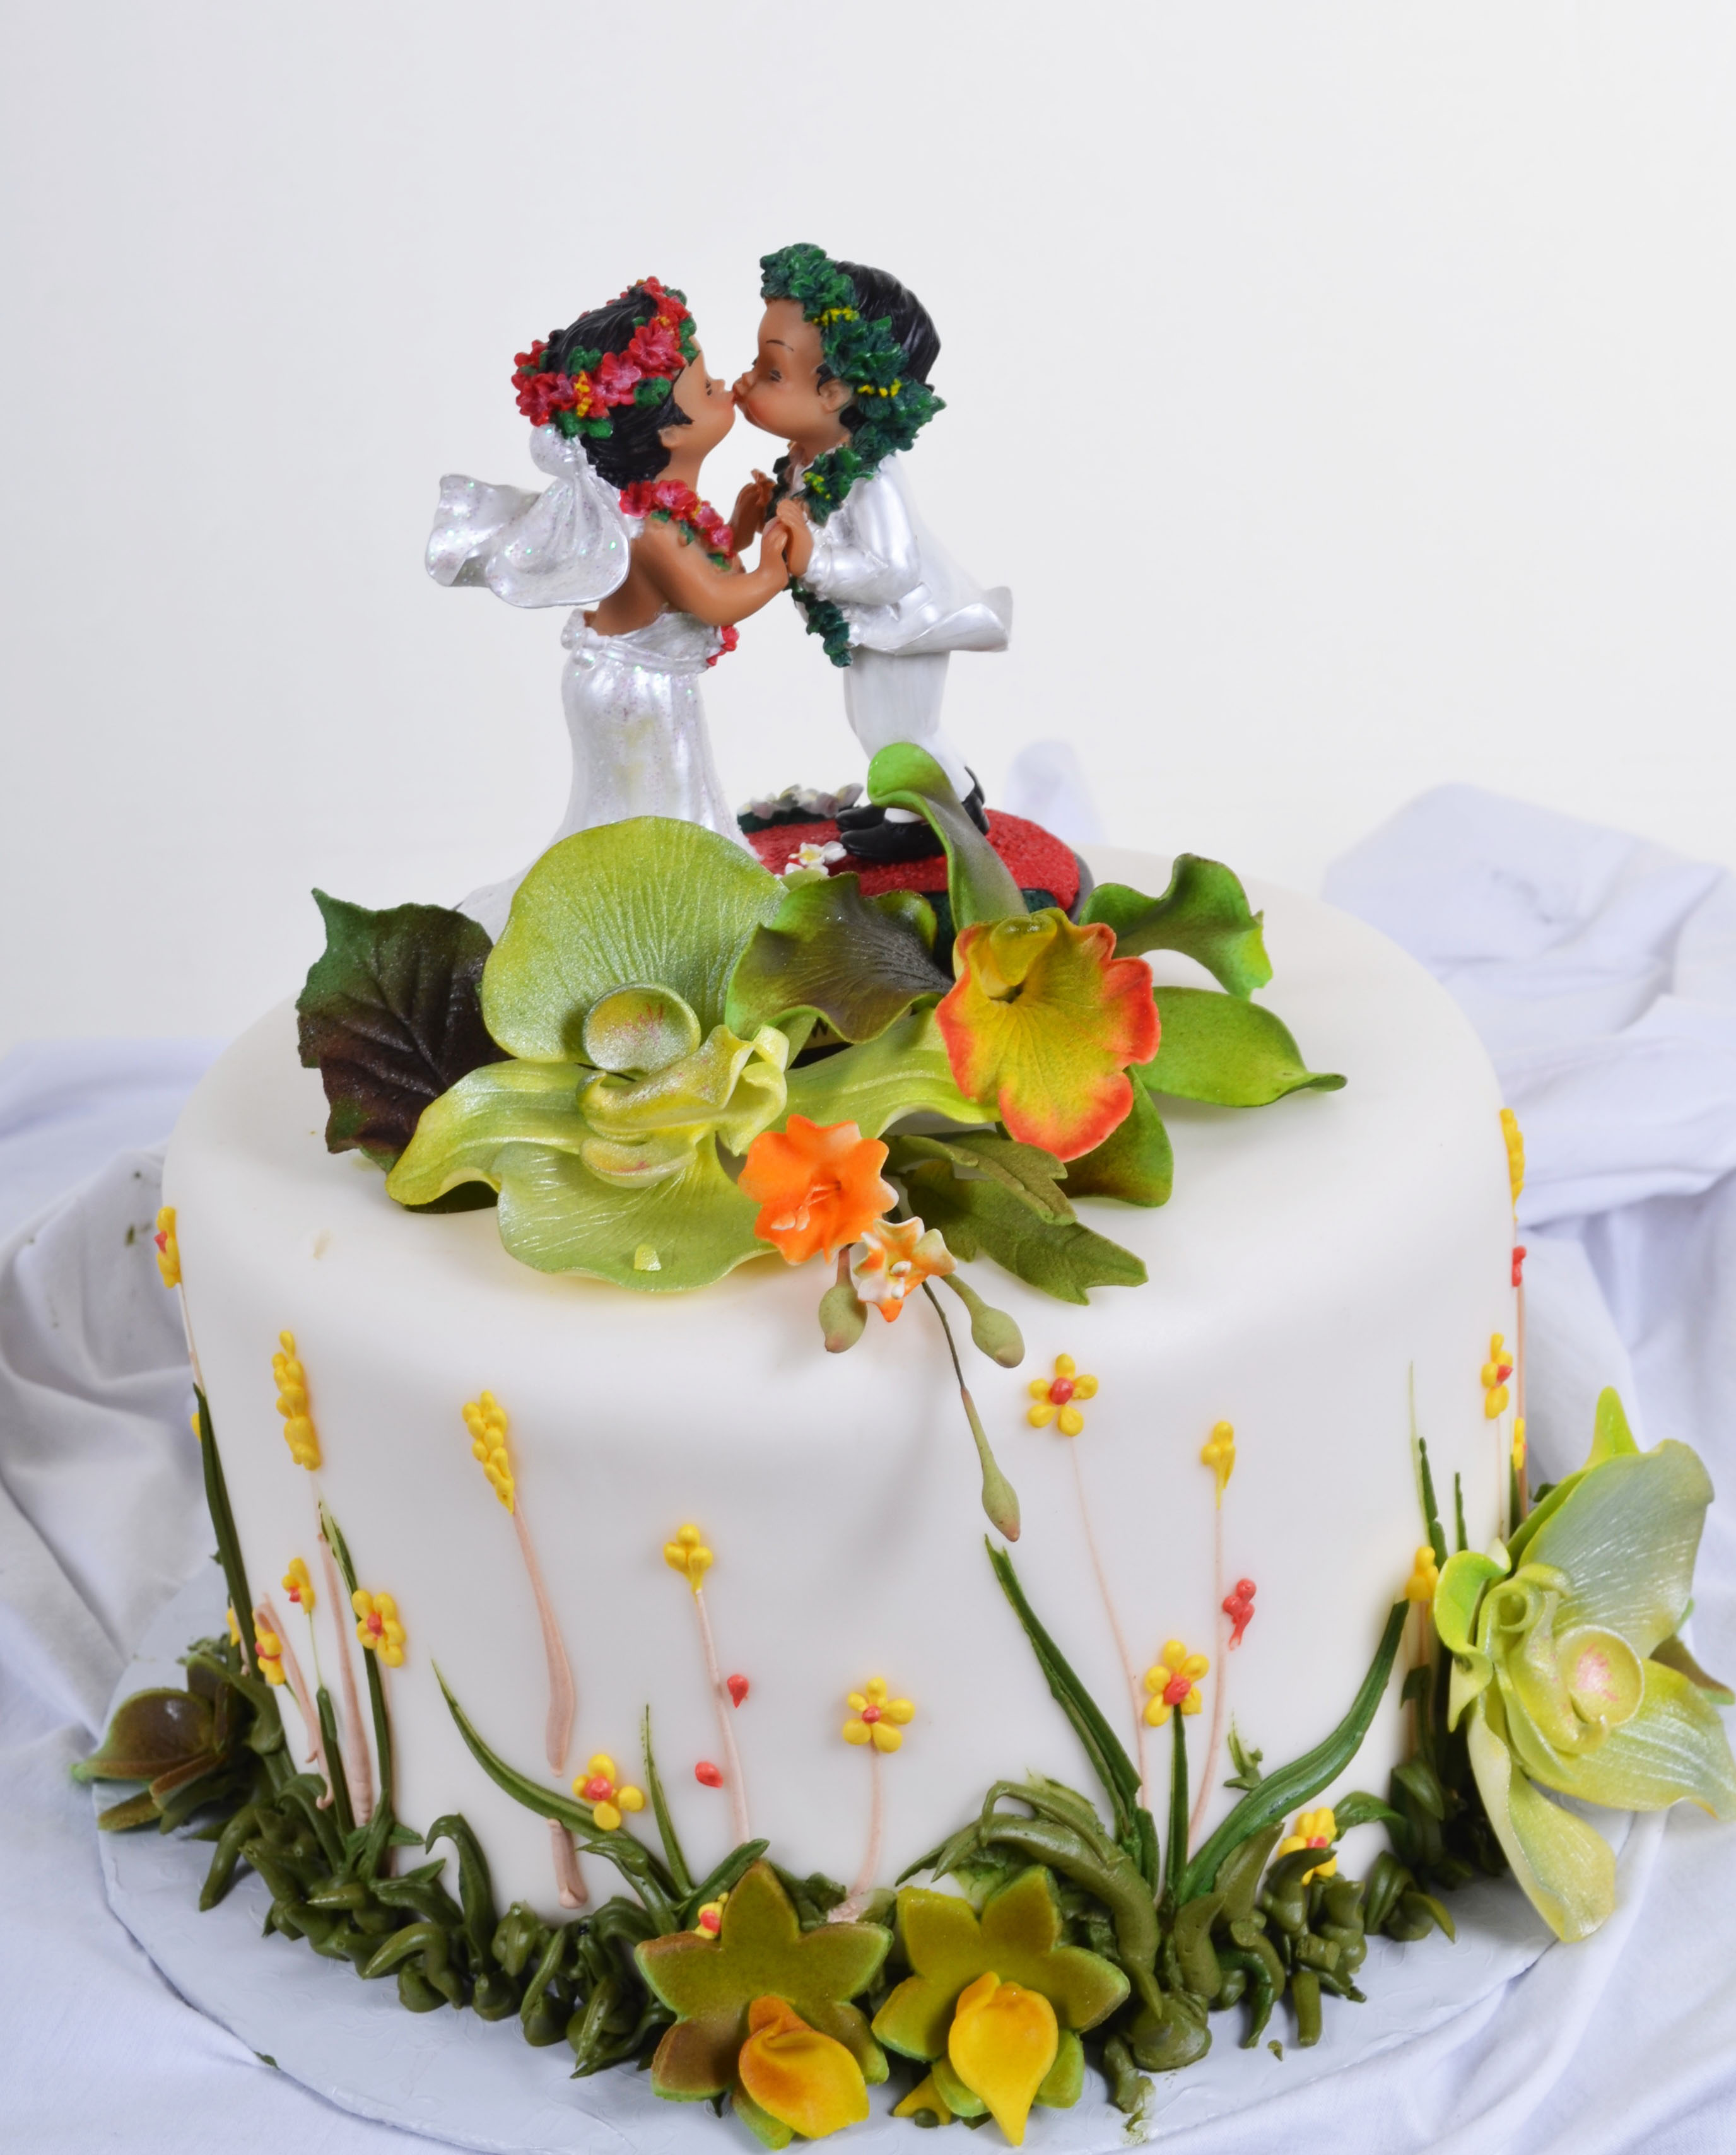 Pastry Palace Las Vegas - Cake #580 - Hawaiian Greens